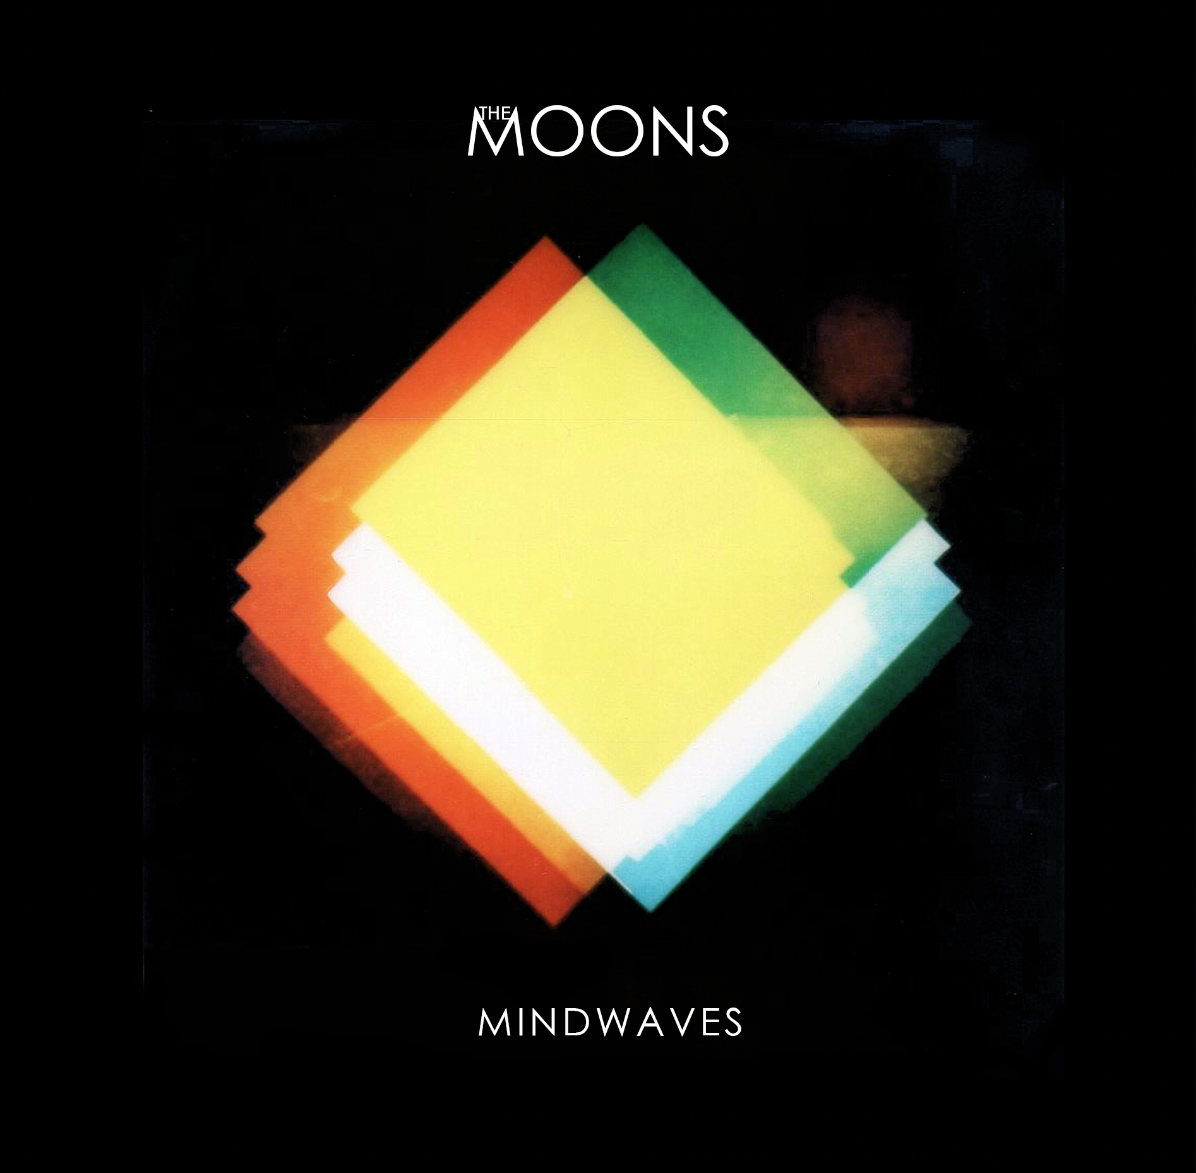 The Moons - Mindwaves - Album